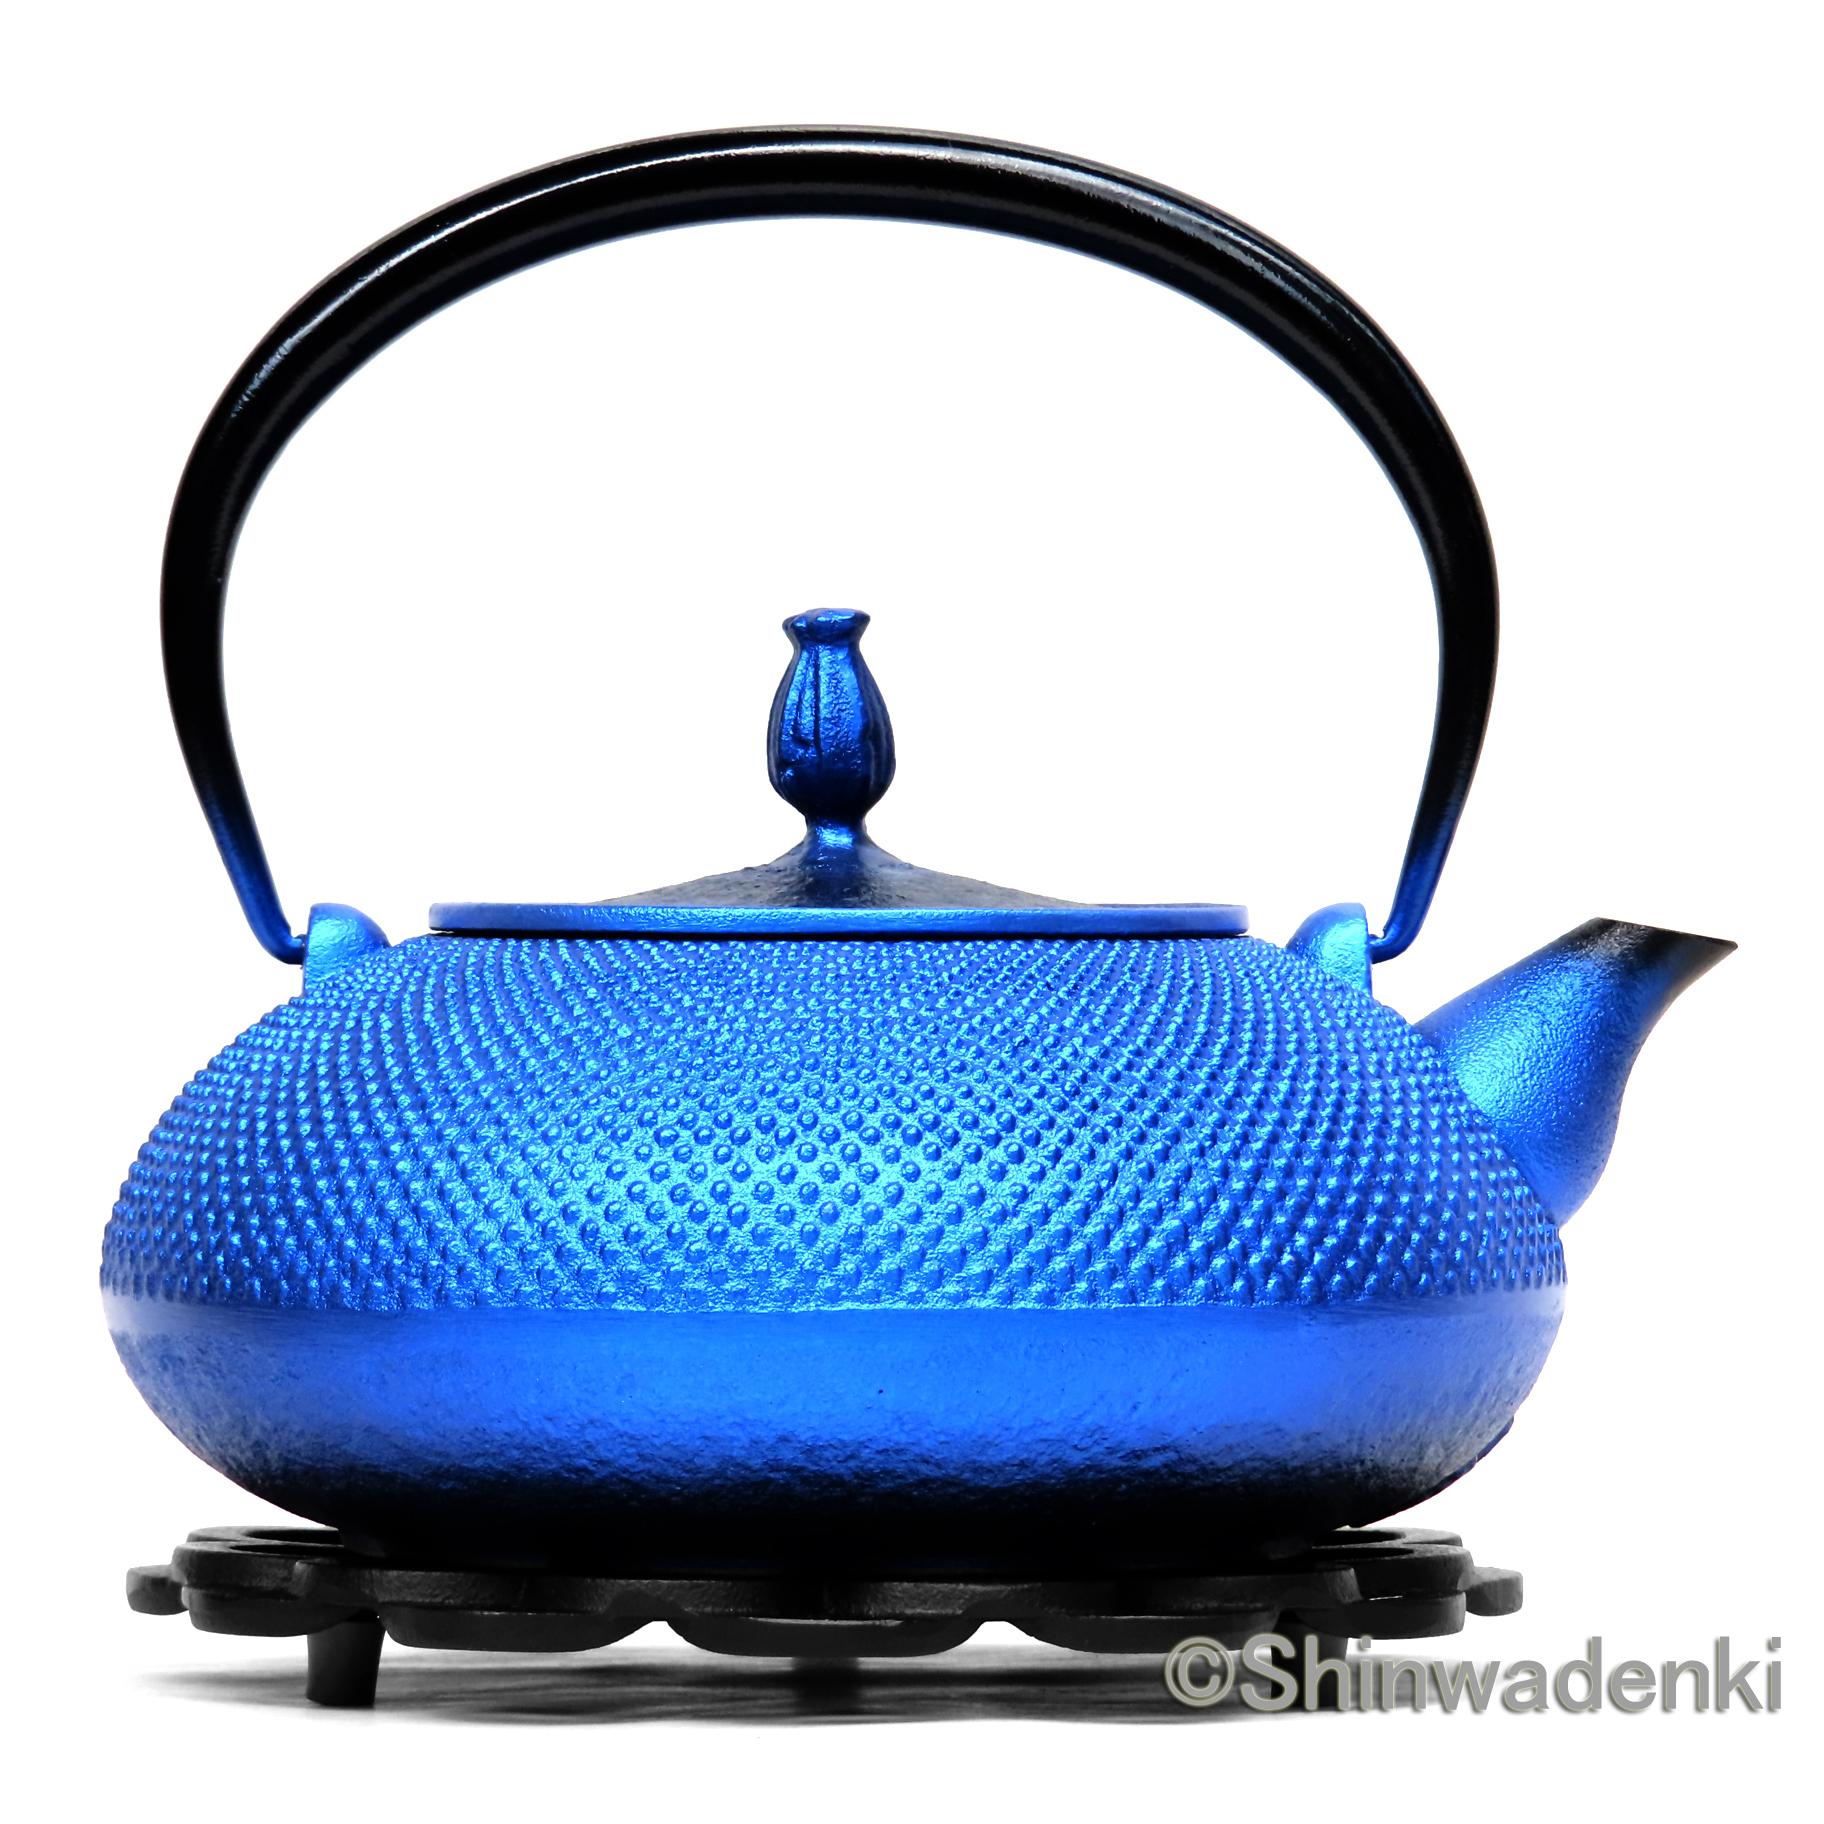 南部鉄器 鉄瓶 平丸アラレ(鉄蓋)瑠璃色